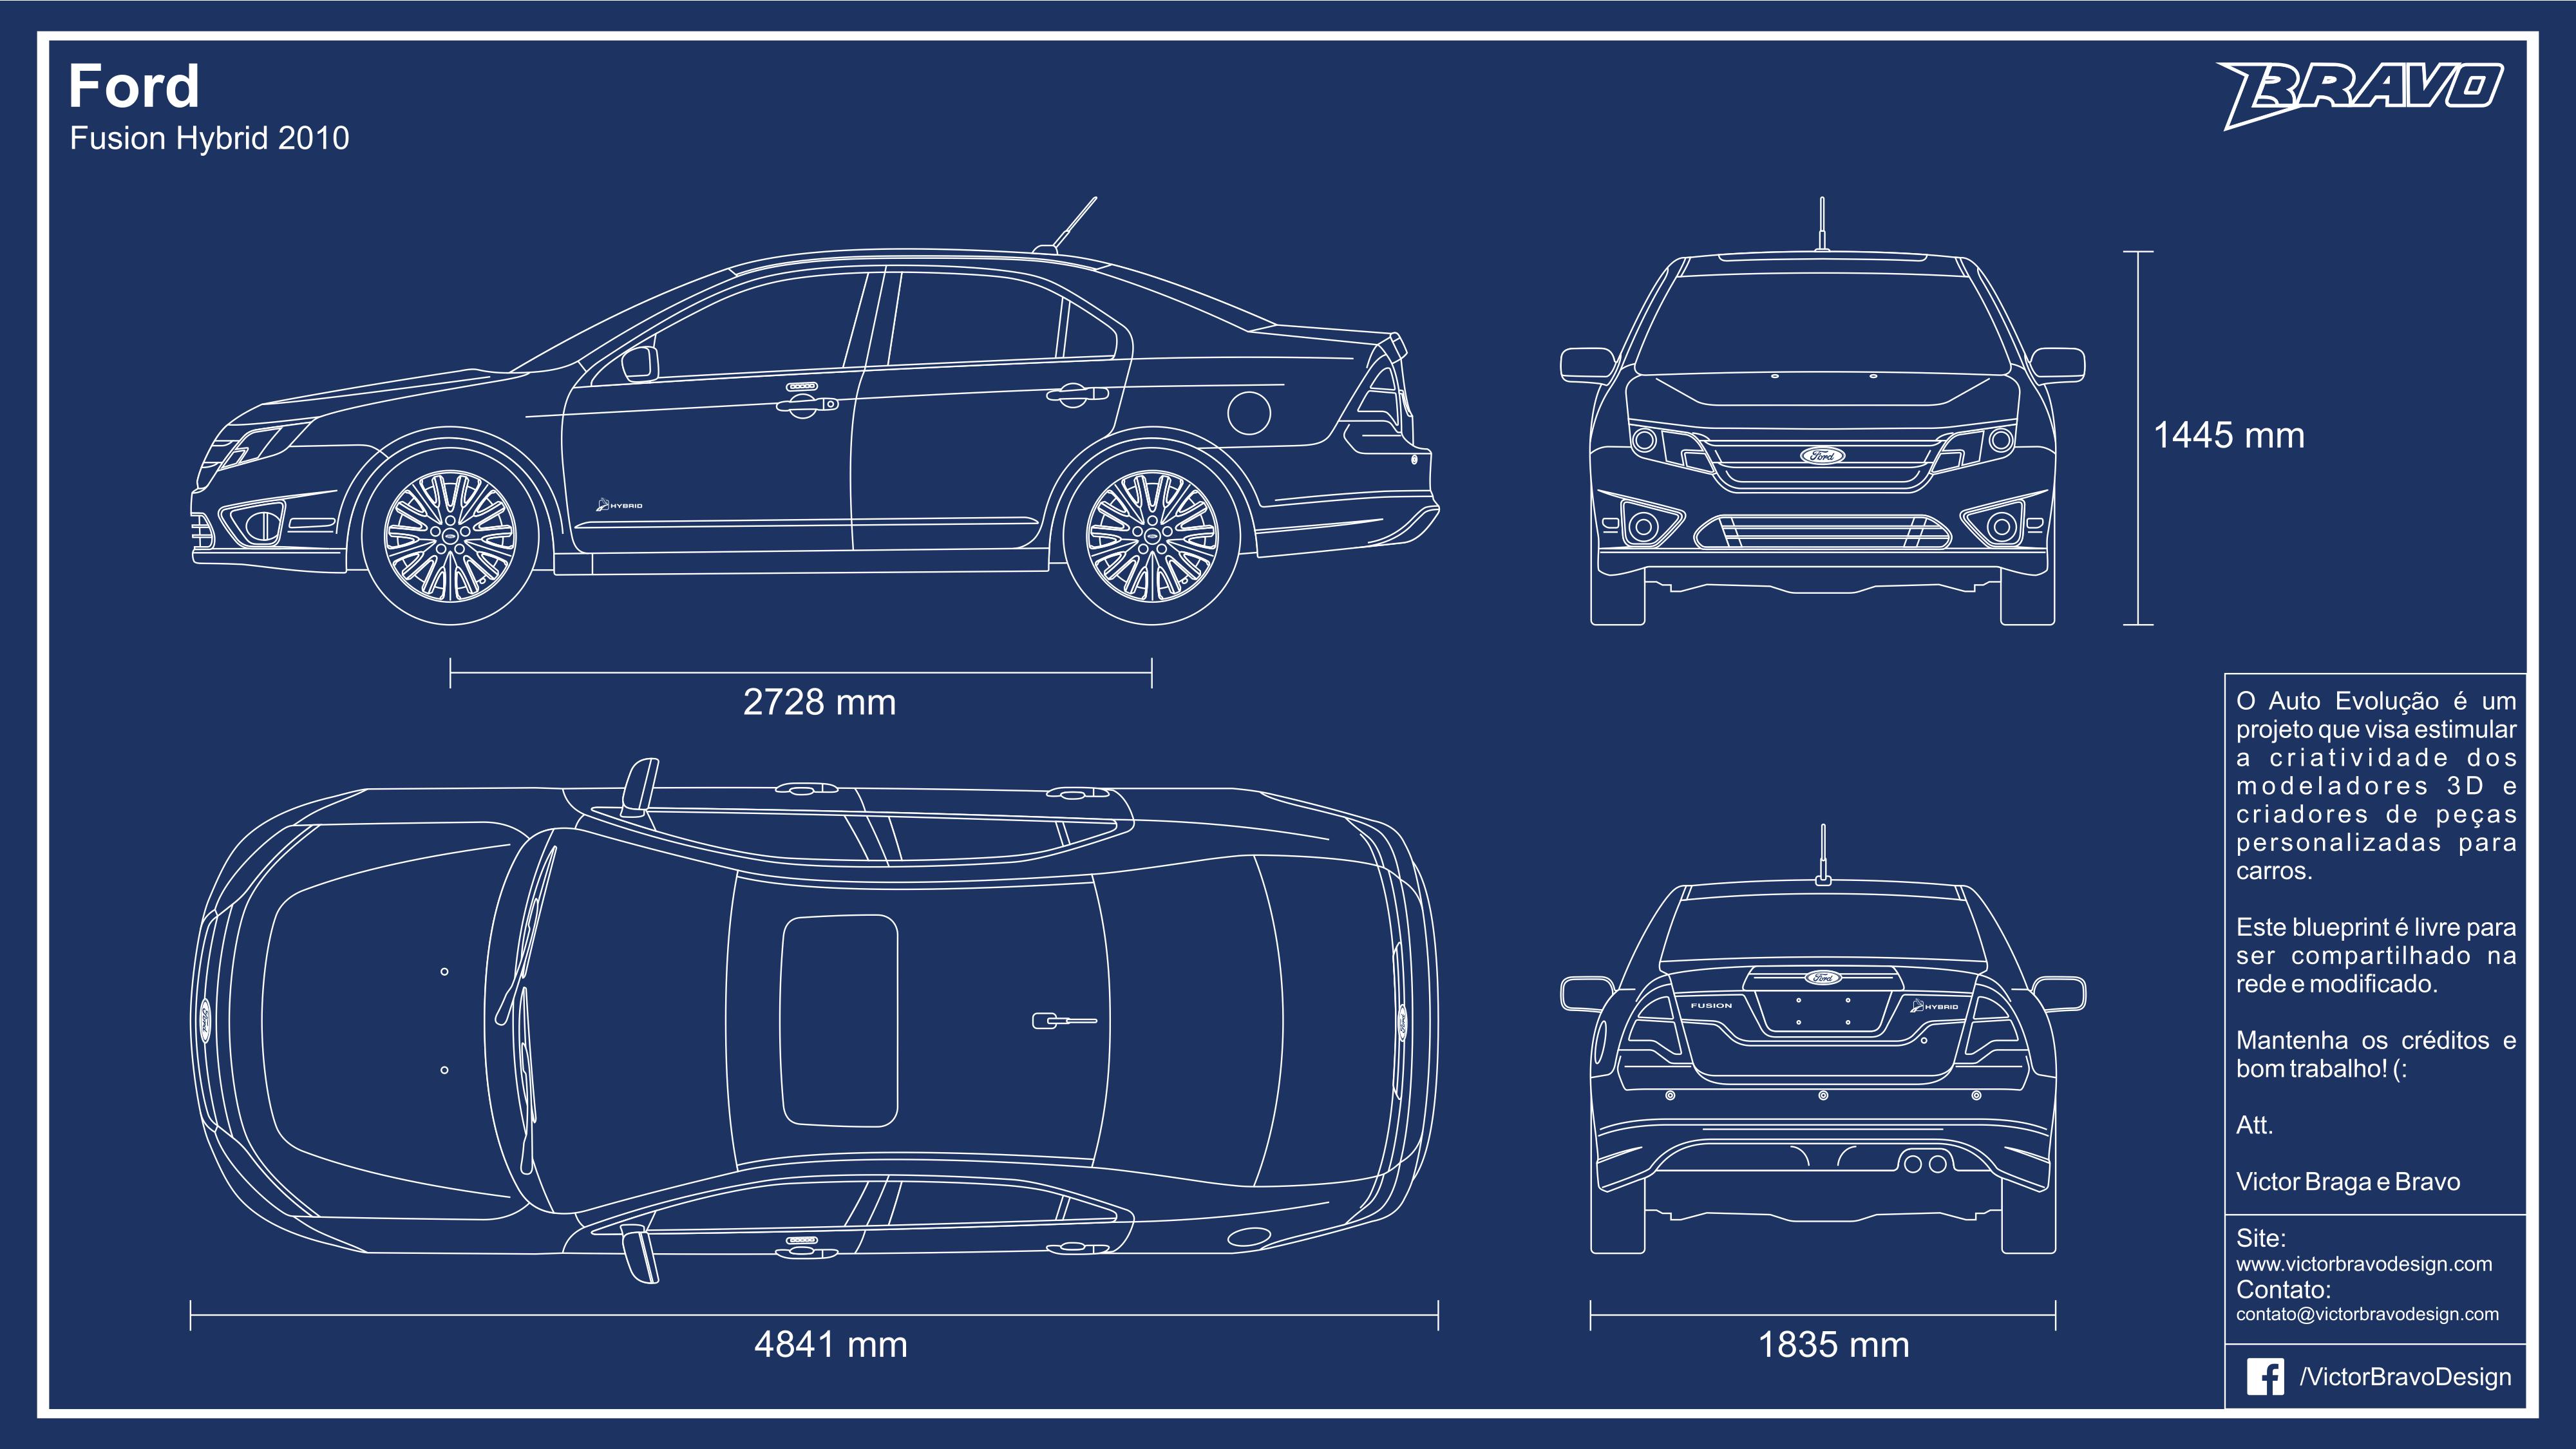 2017 Ford Fusion Hybrid Se >> Blueprints - Ford Fusion Hybrid 2010